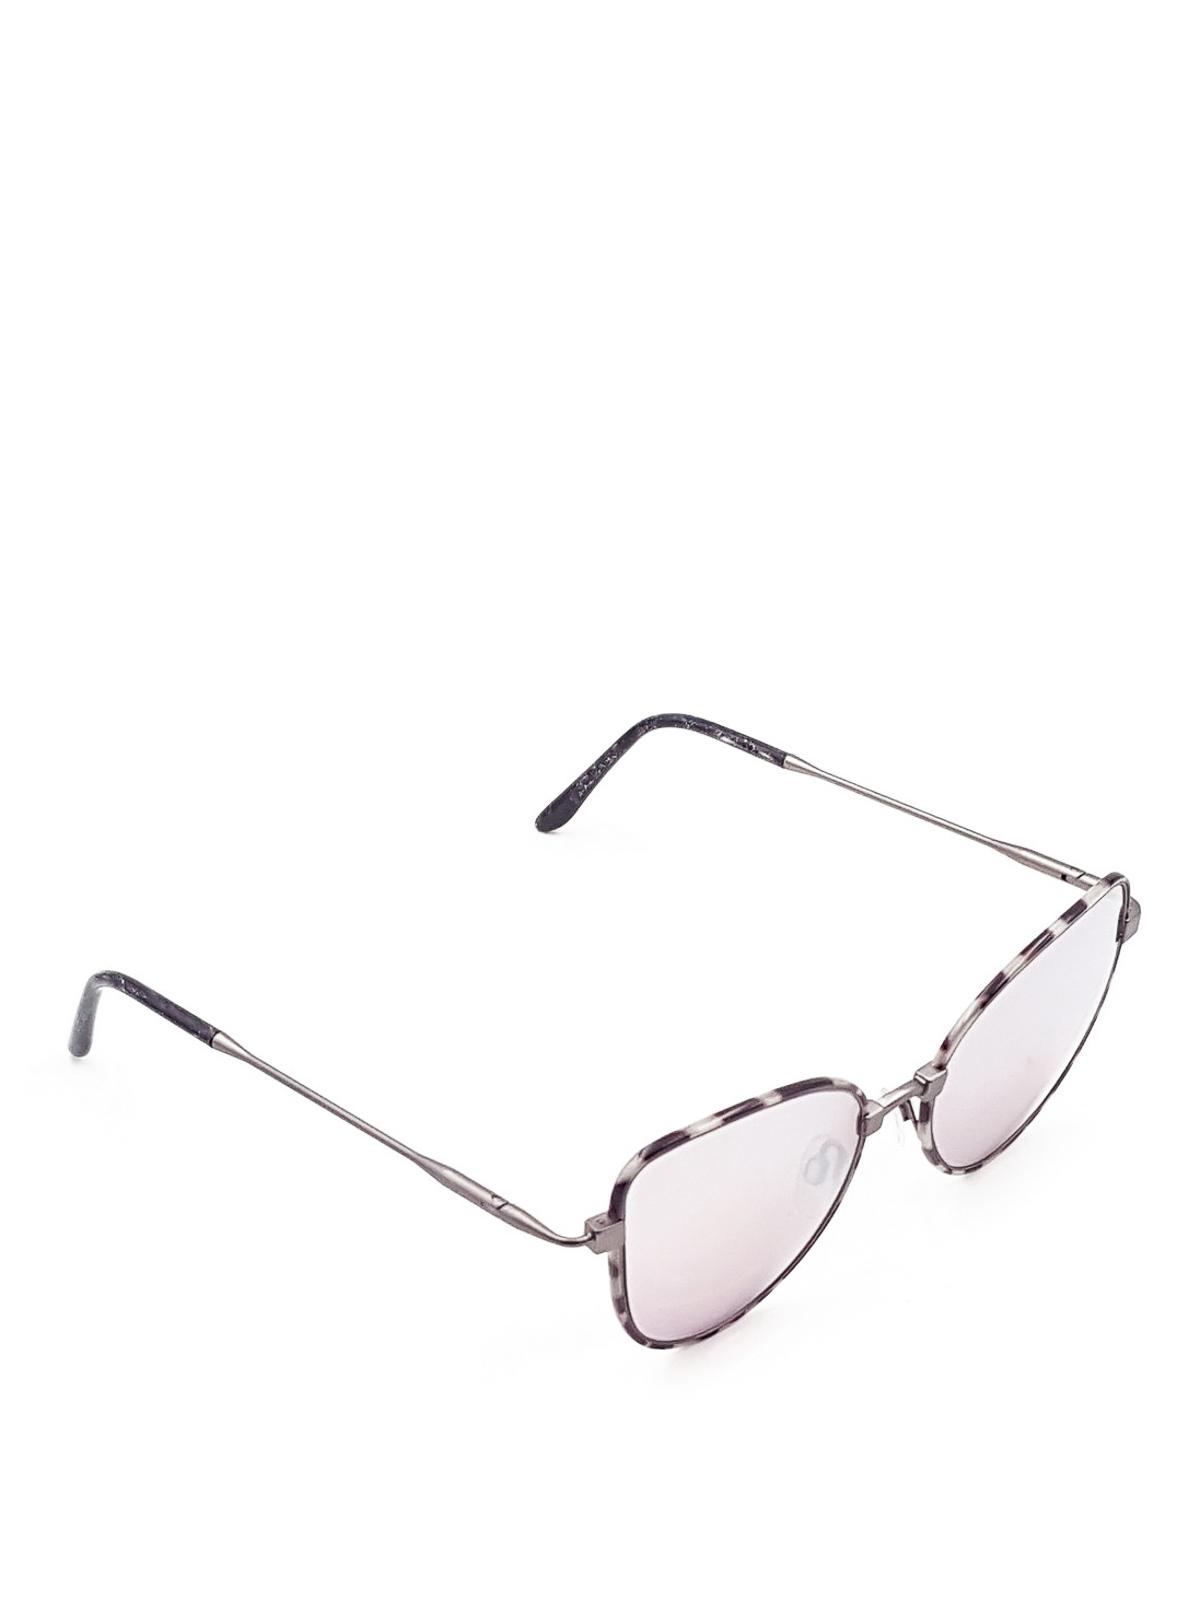 836a583bbe Cutler And Gross - Gafas De Sol Grises Para Unisex - Gafas de sol ...